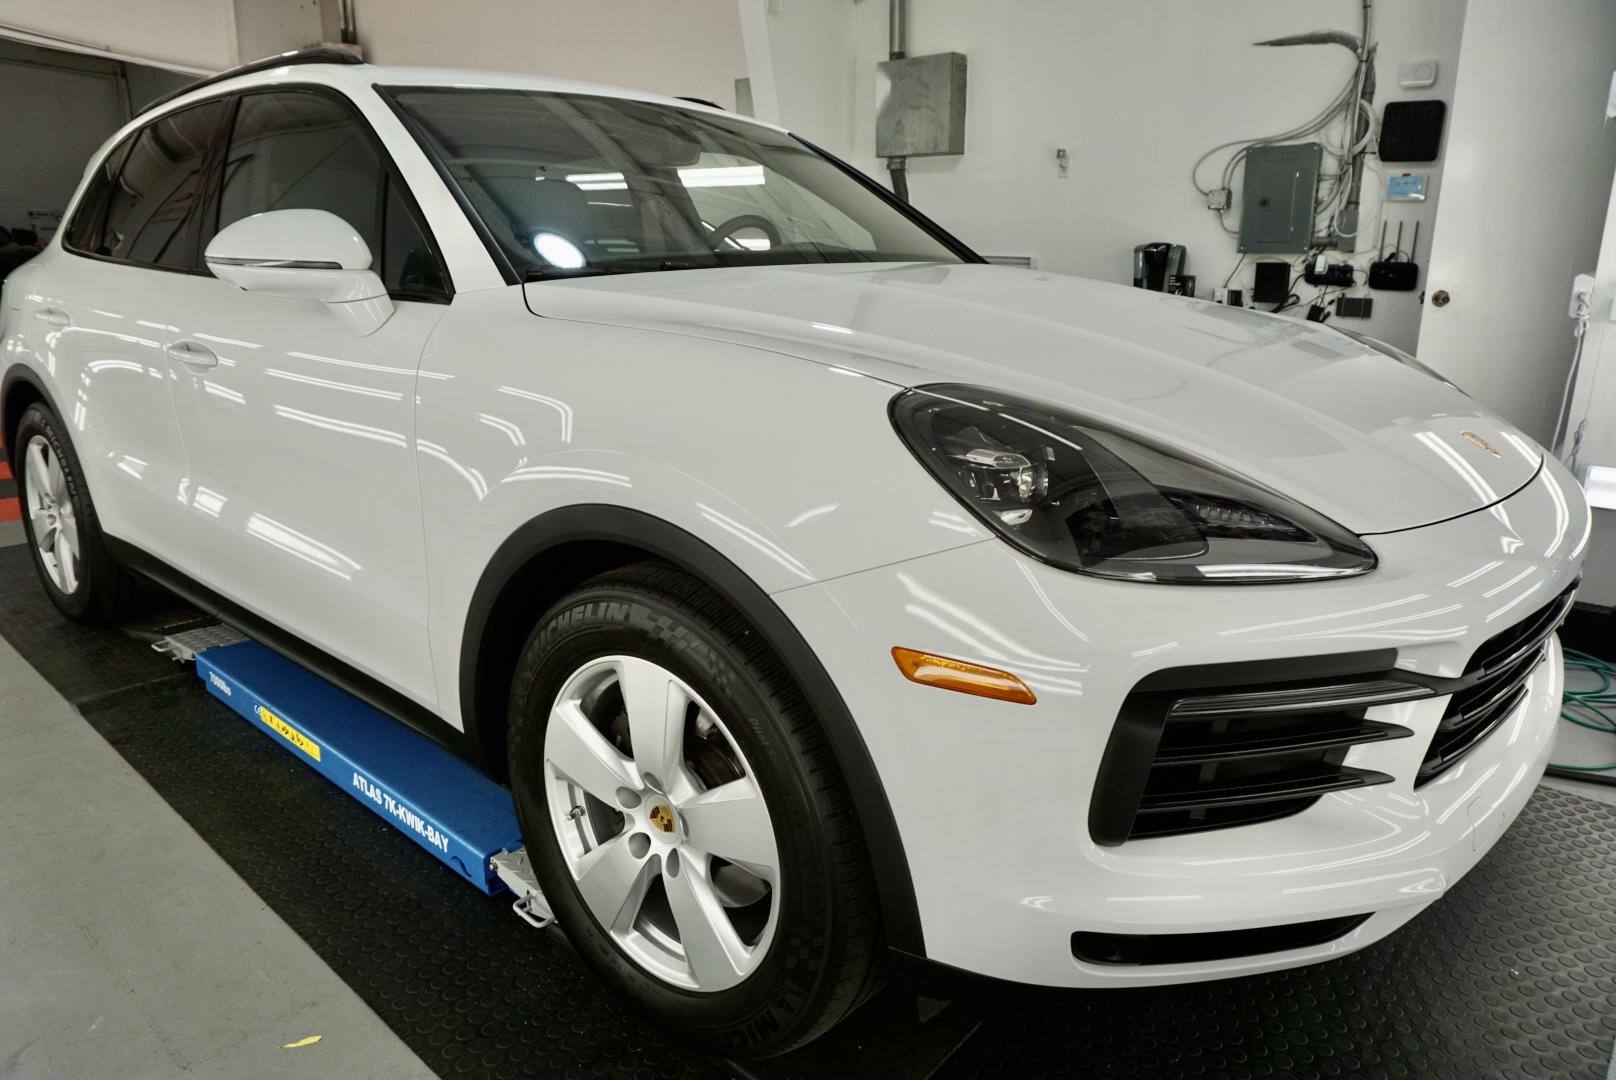 New Car Preparation of a 2021 Porsche Cayenne